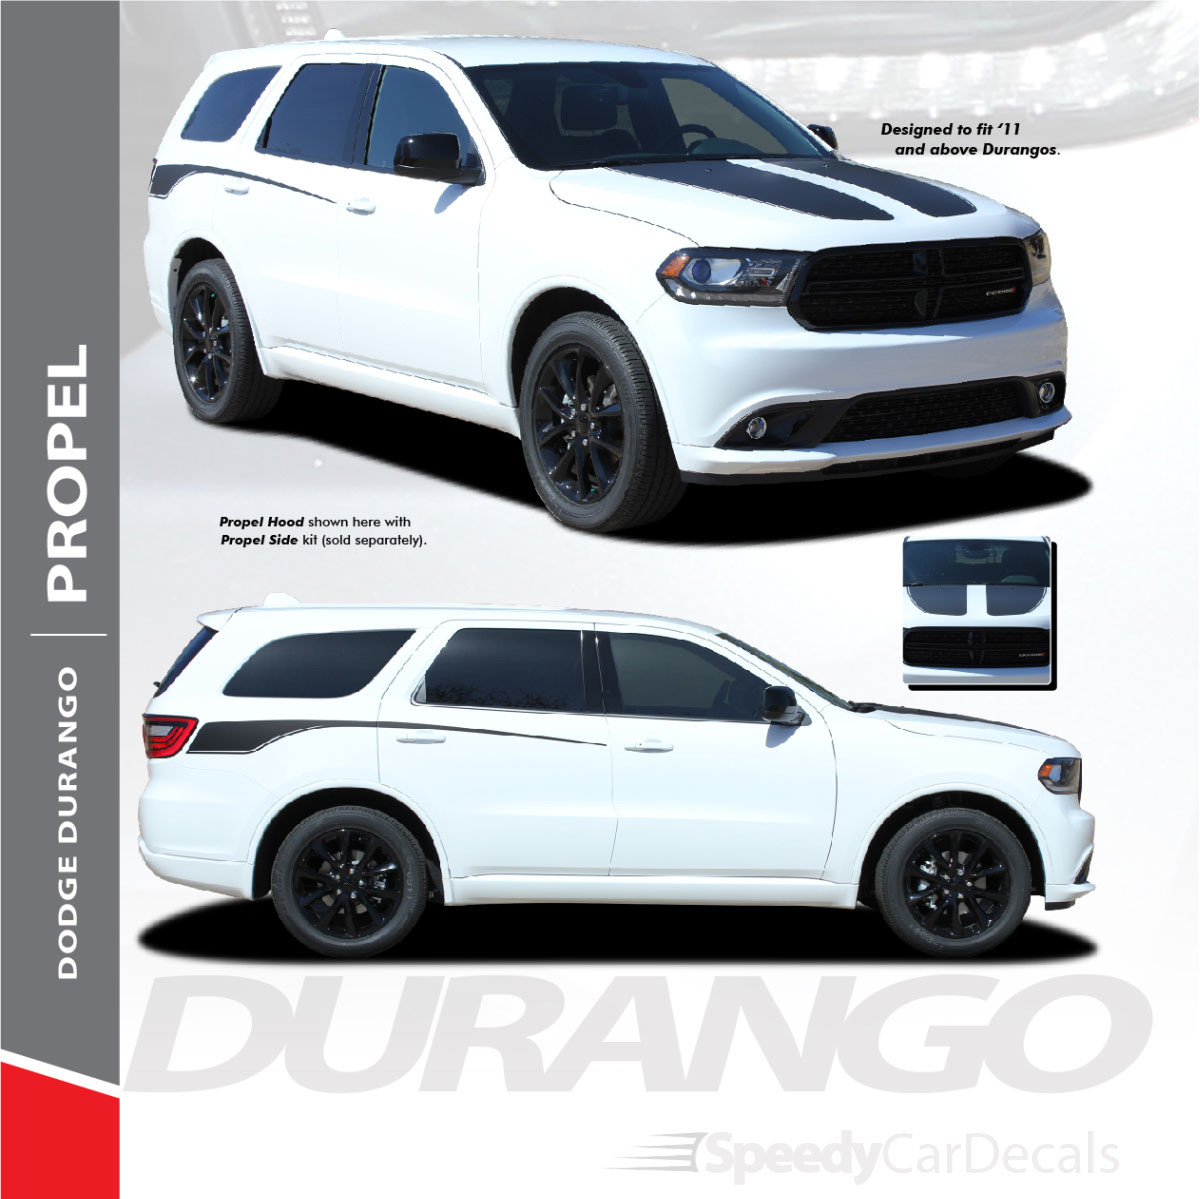 2011-2020 2021 Dodge Durango PROPEL Hood & Side Stripes